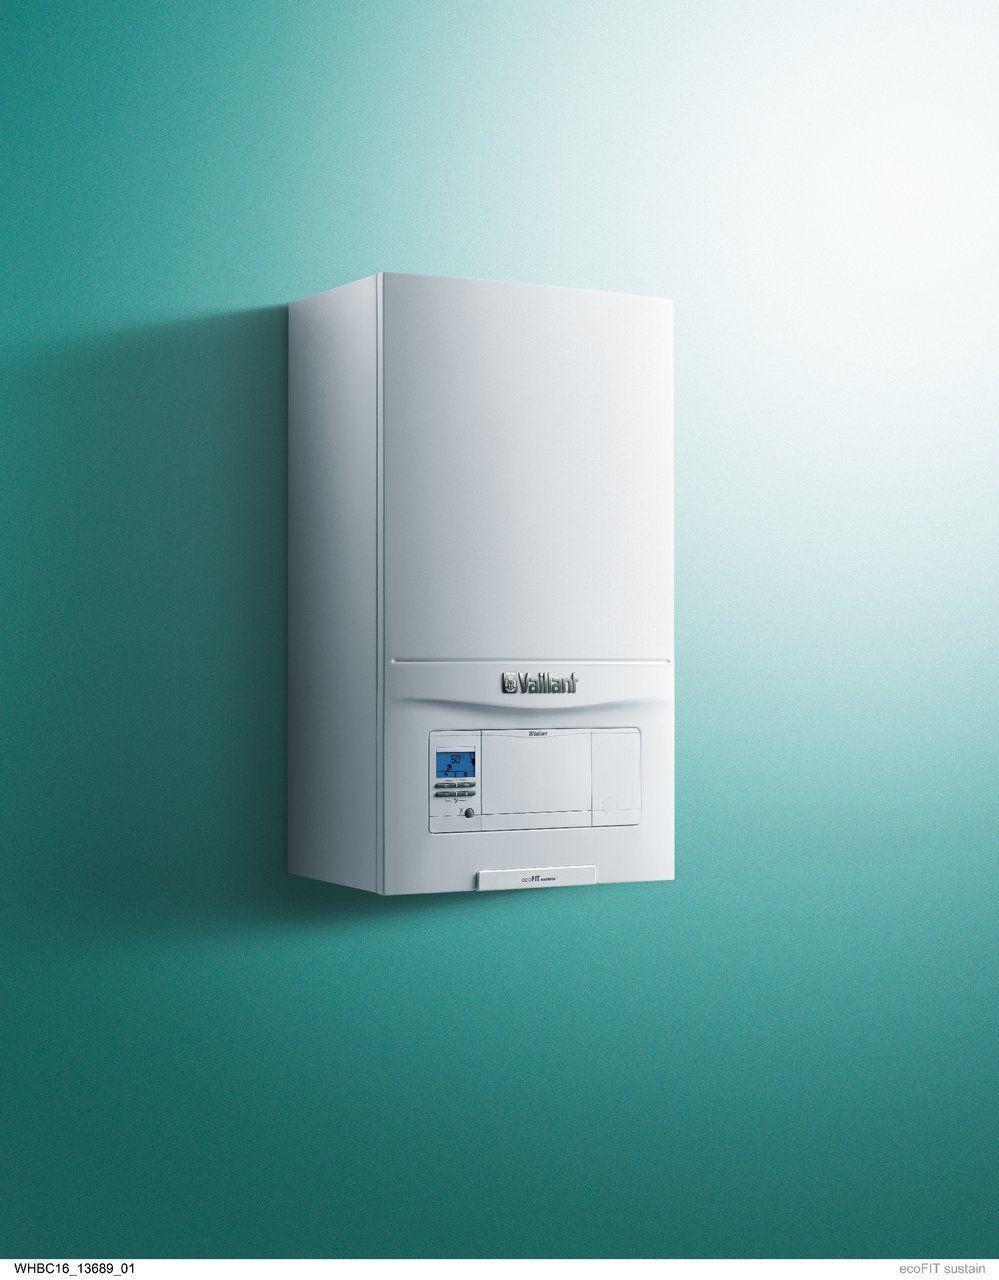 Vaillant ecoFIT sustain combi boiler range featured image